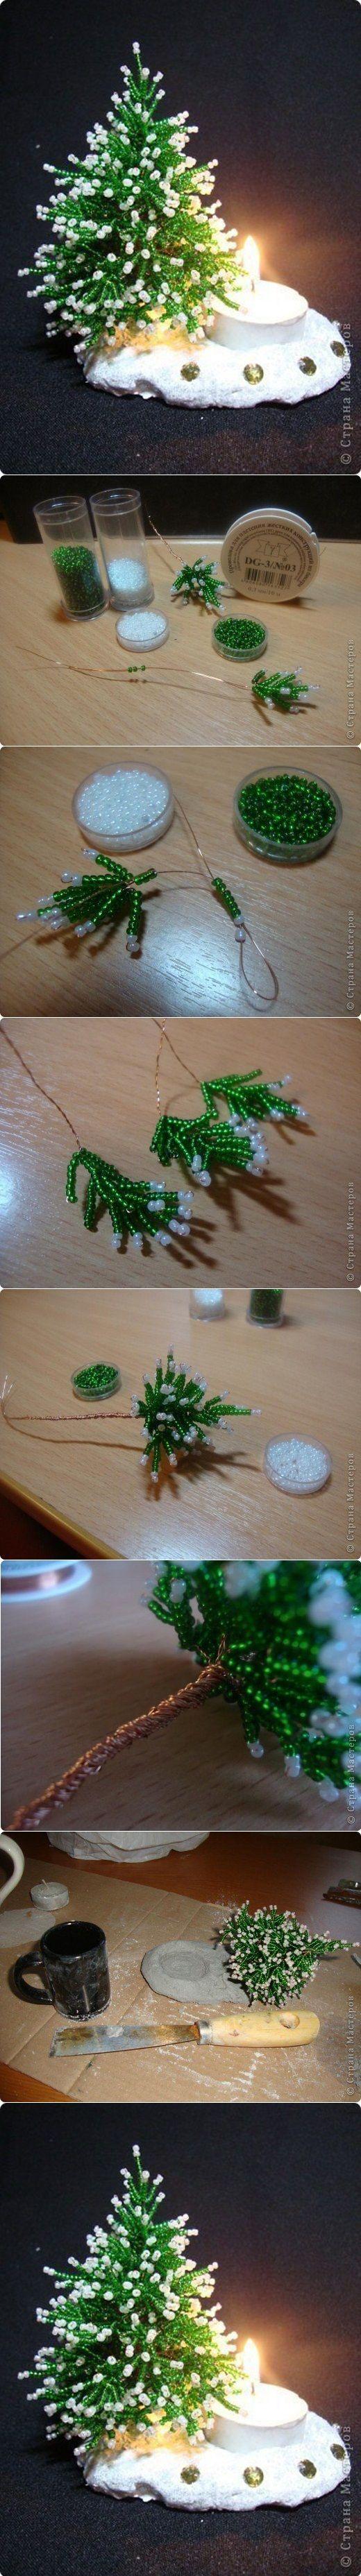 Herringbone Beads Miniature Christmas Tree